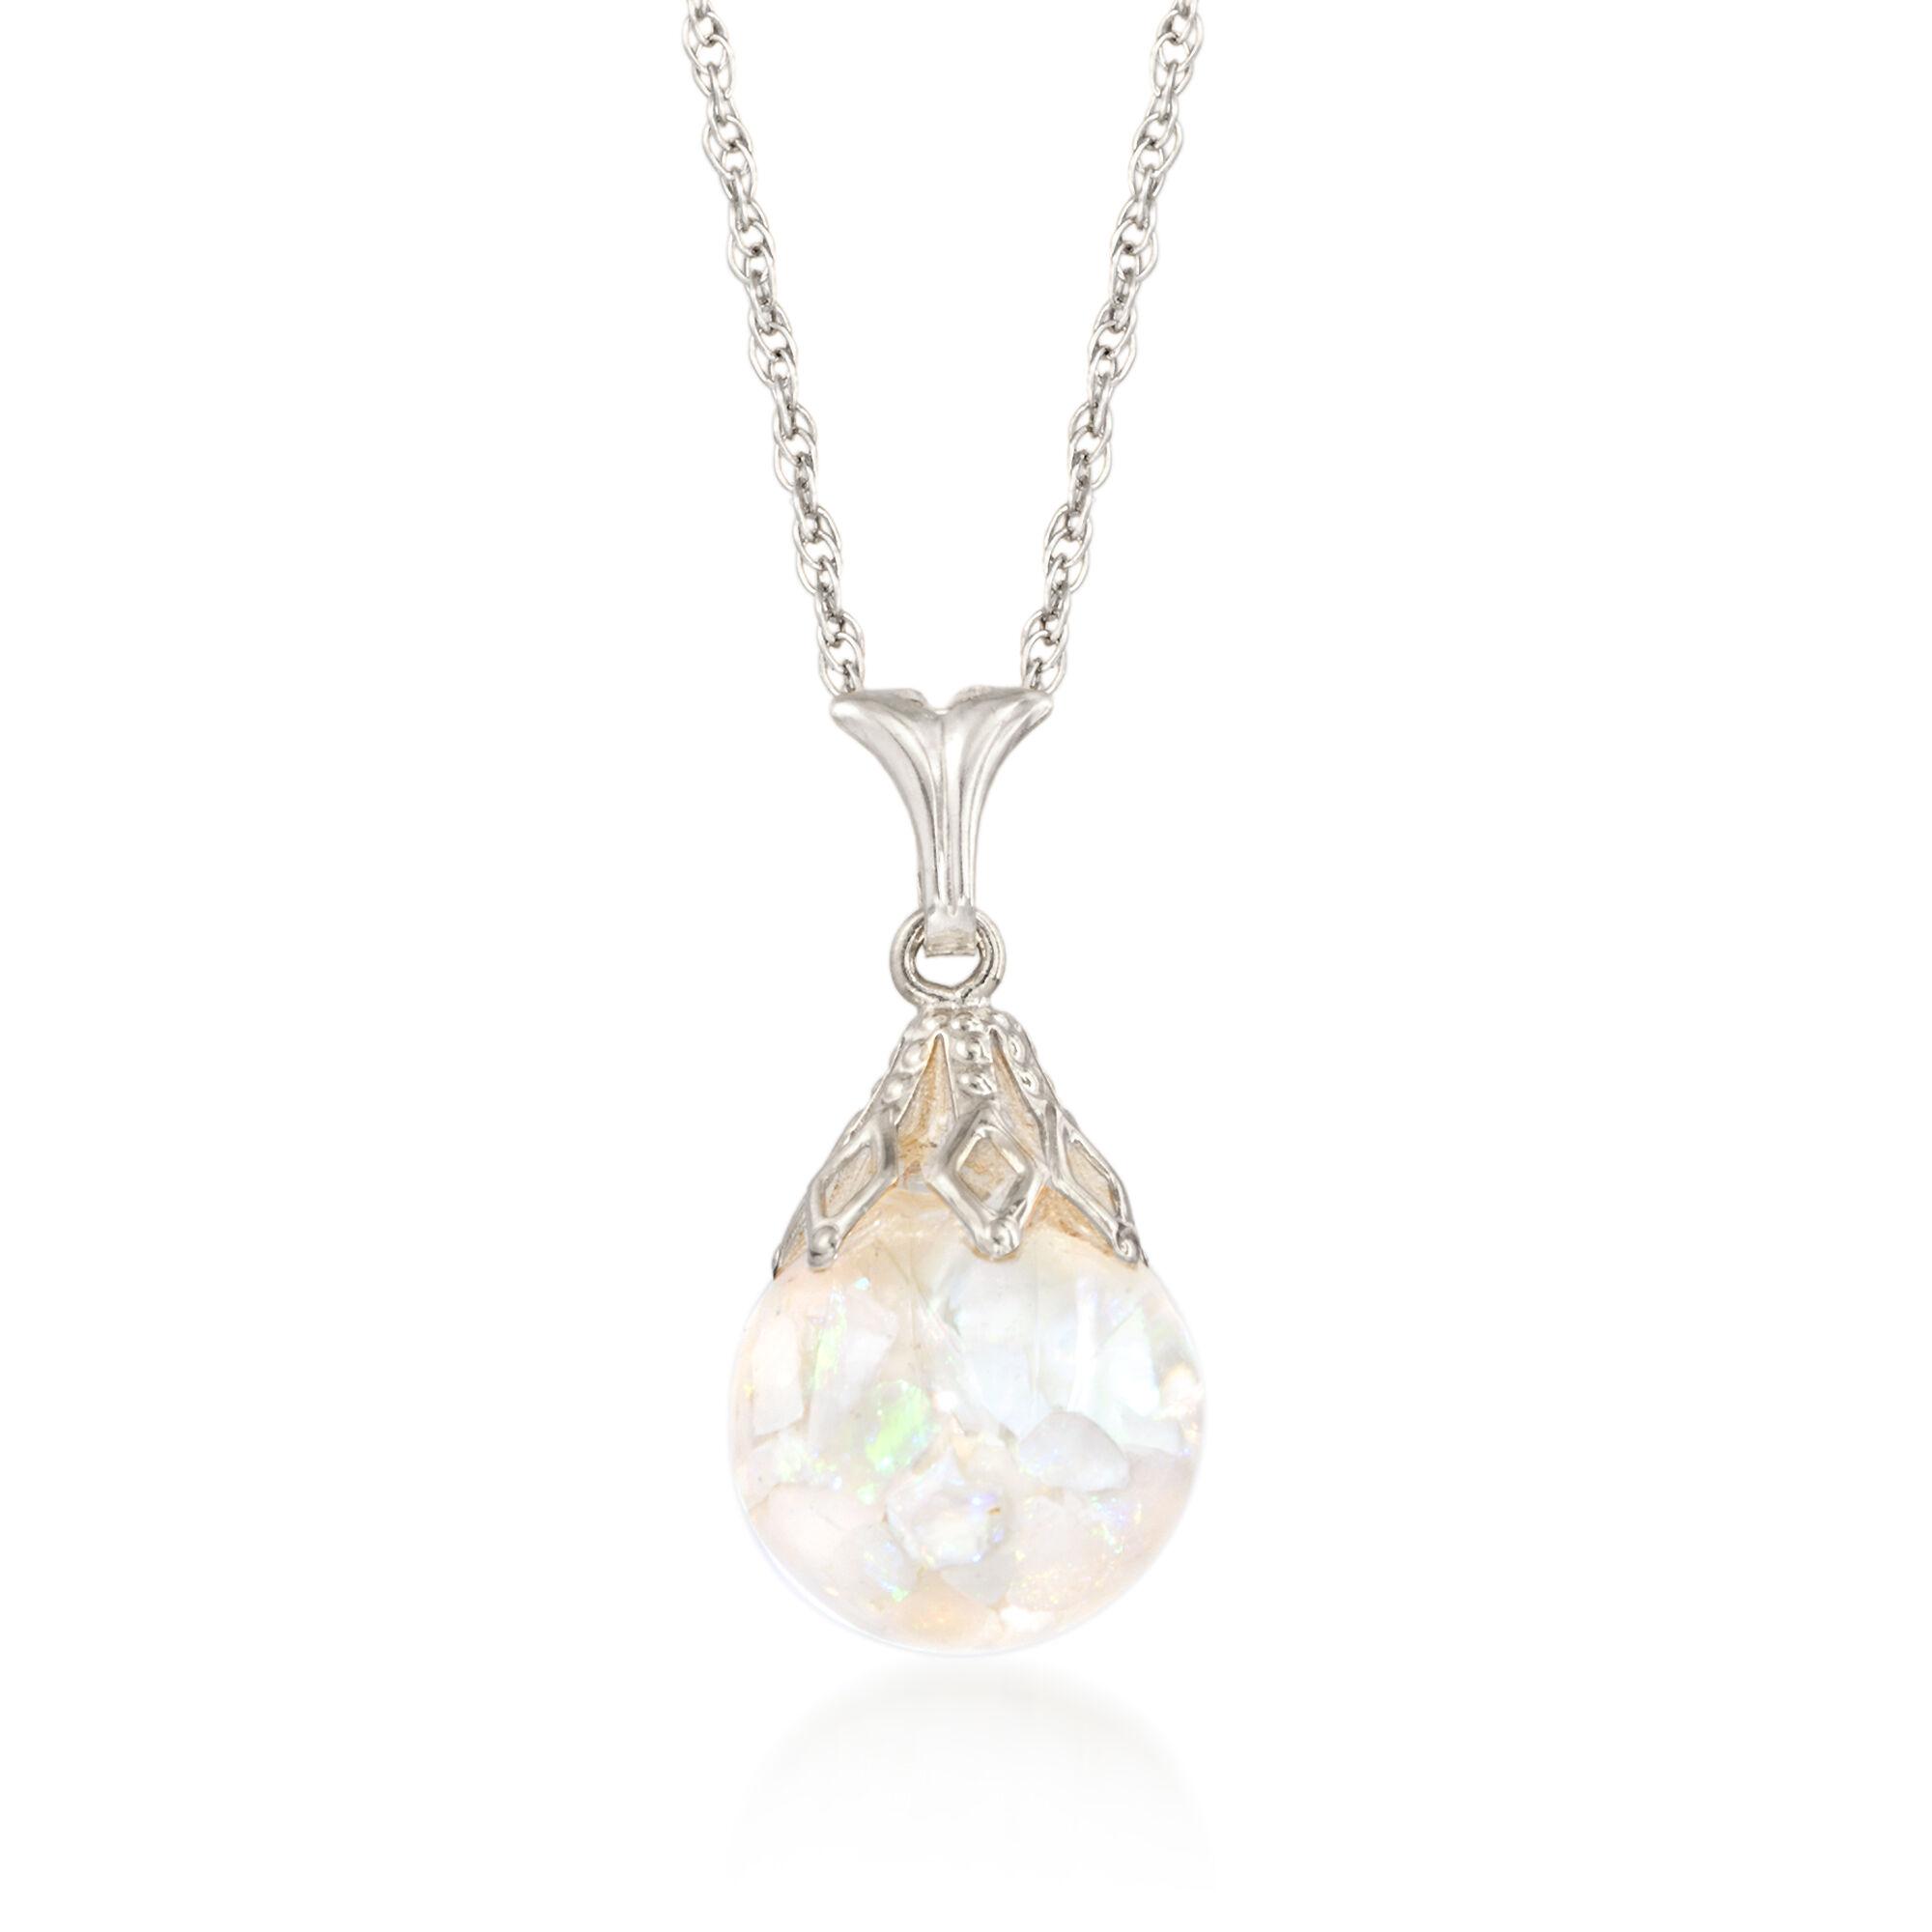 Golden Topaz Fire Tone Tear Drop Necklace Pendant Jewellery Couple Gift Love